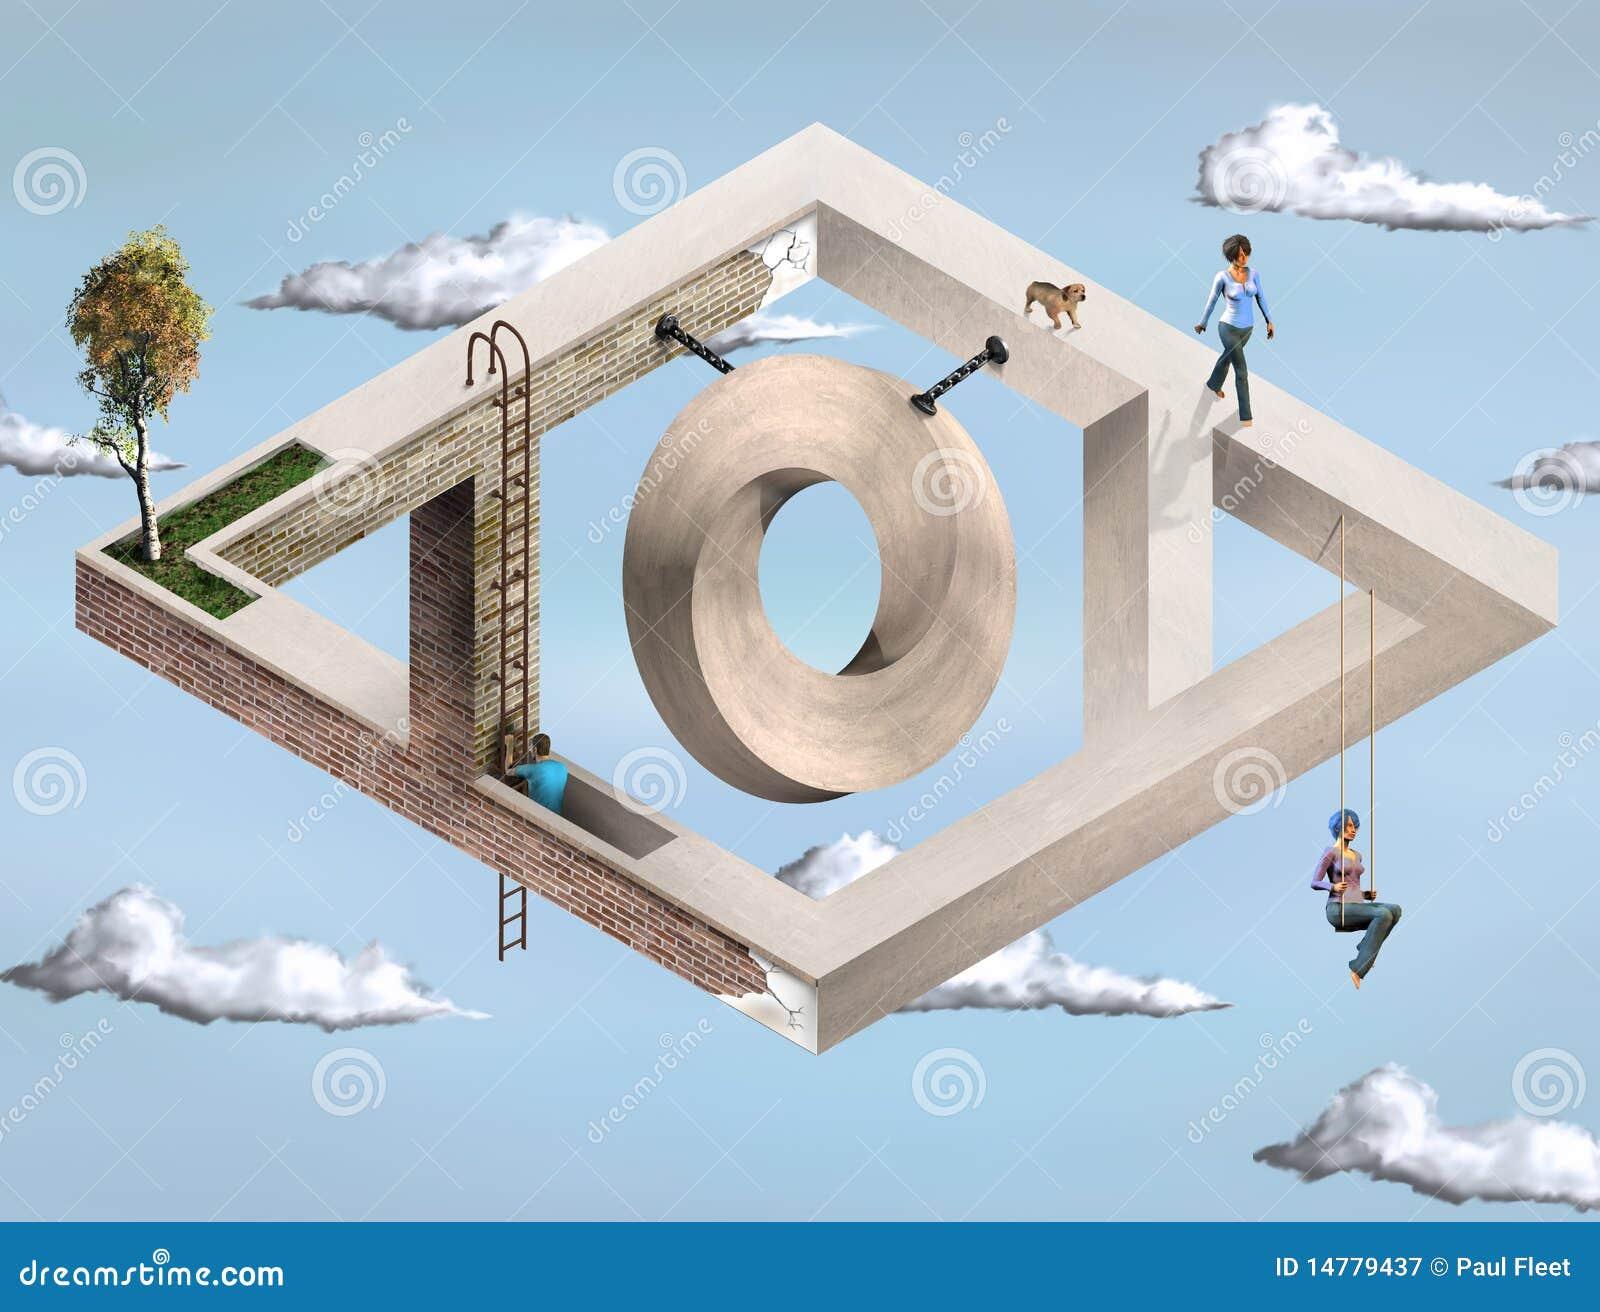 Impossible geometric architecture stock illustration for Architecture impossible